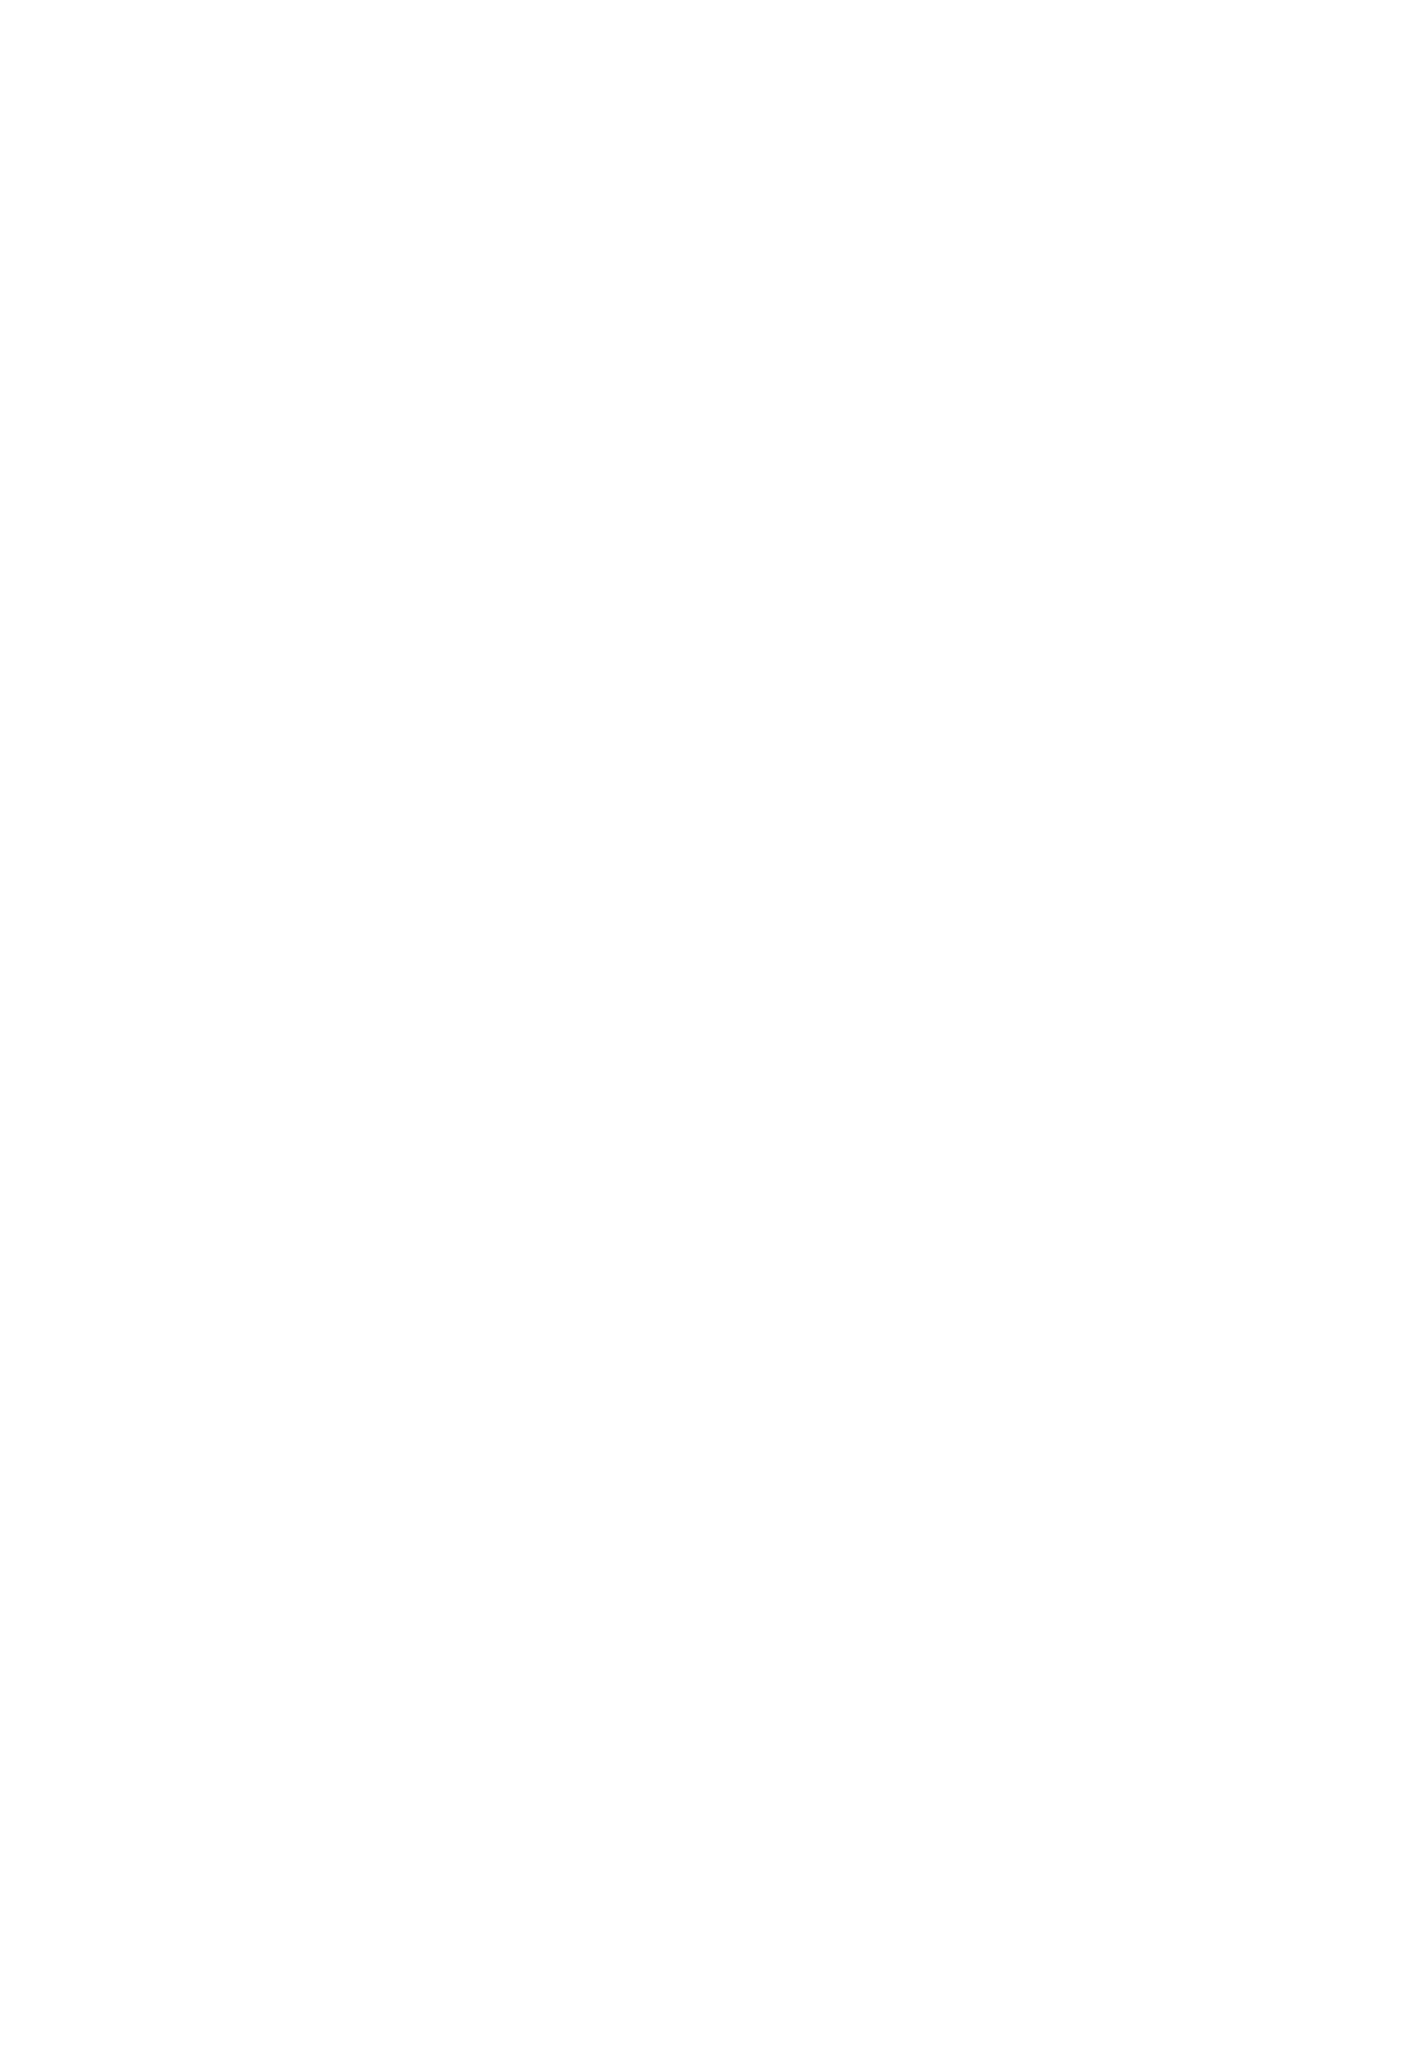 Image-Interstella-11